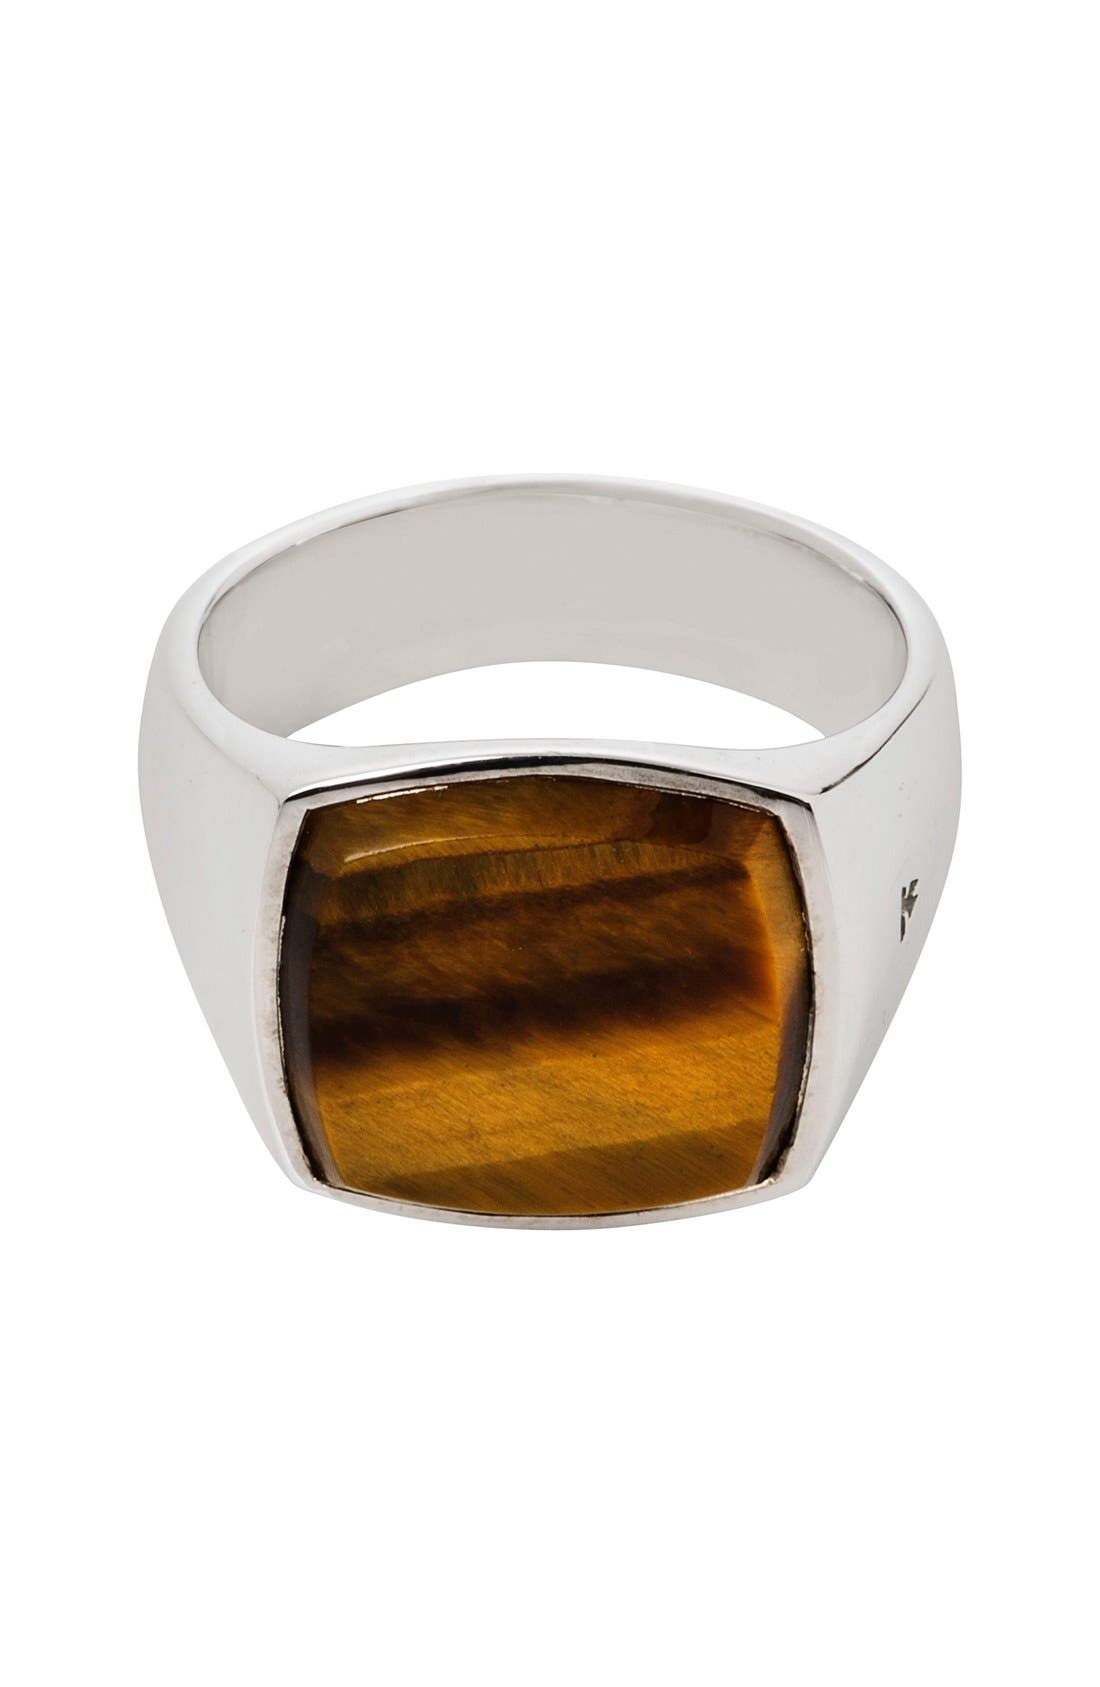 Tom Wood Cushion Tiger's Eye Signet Ring